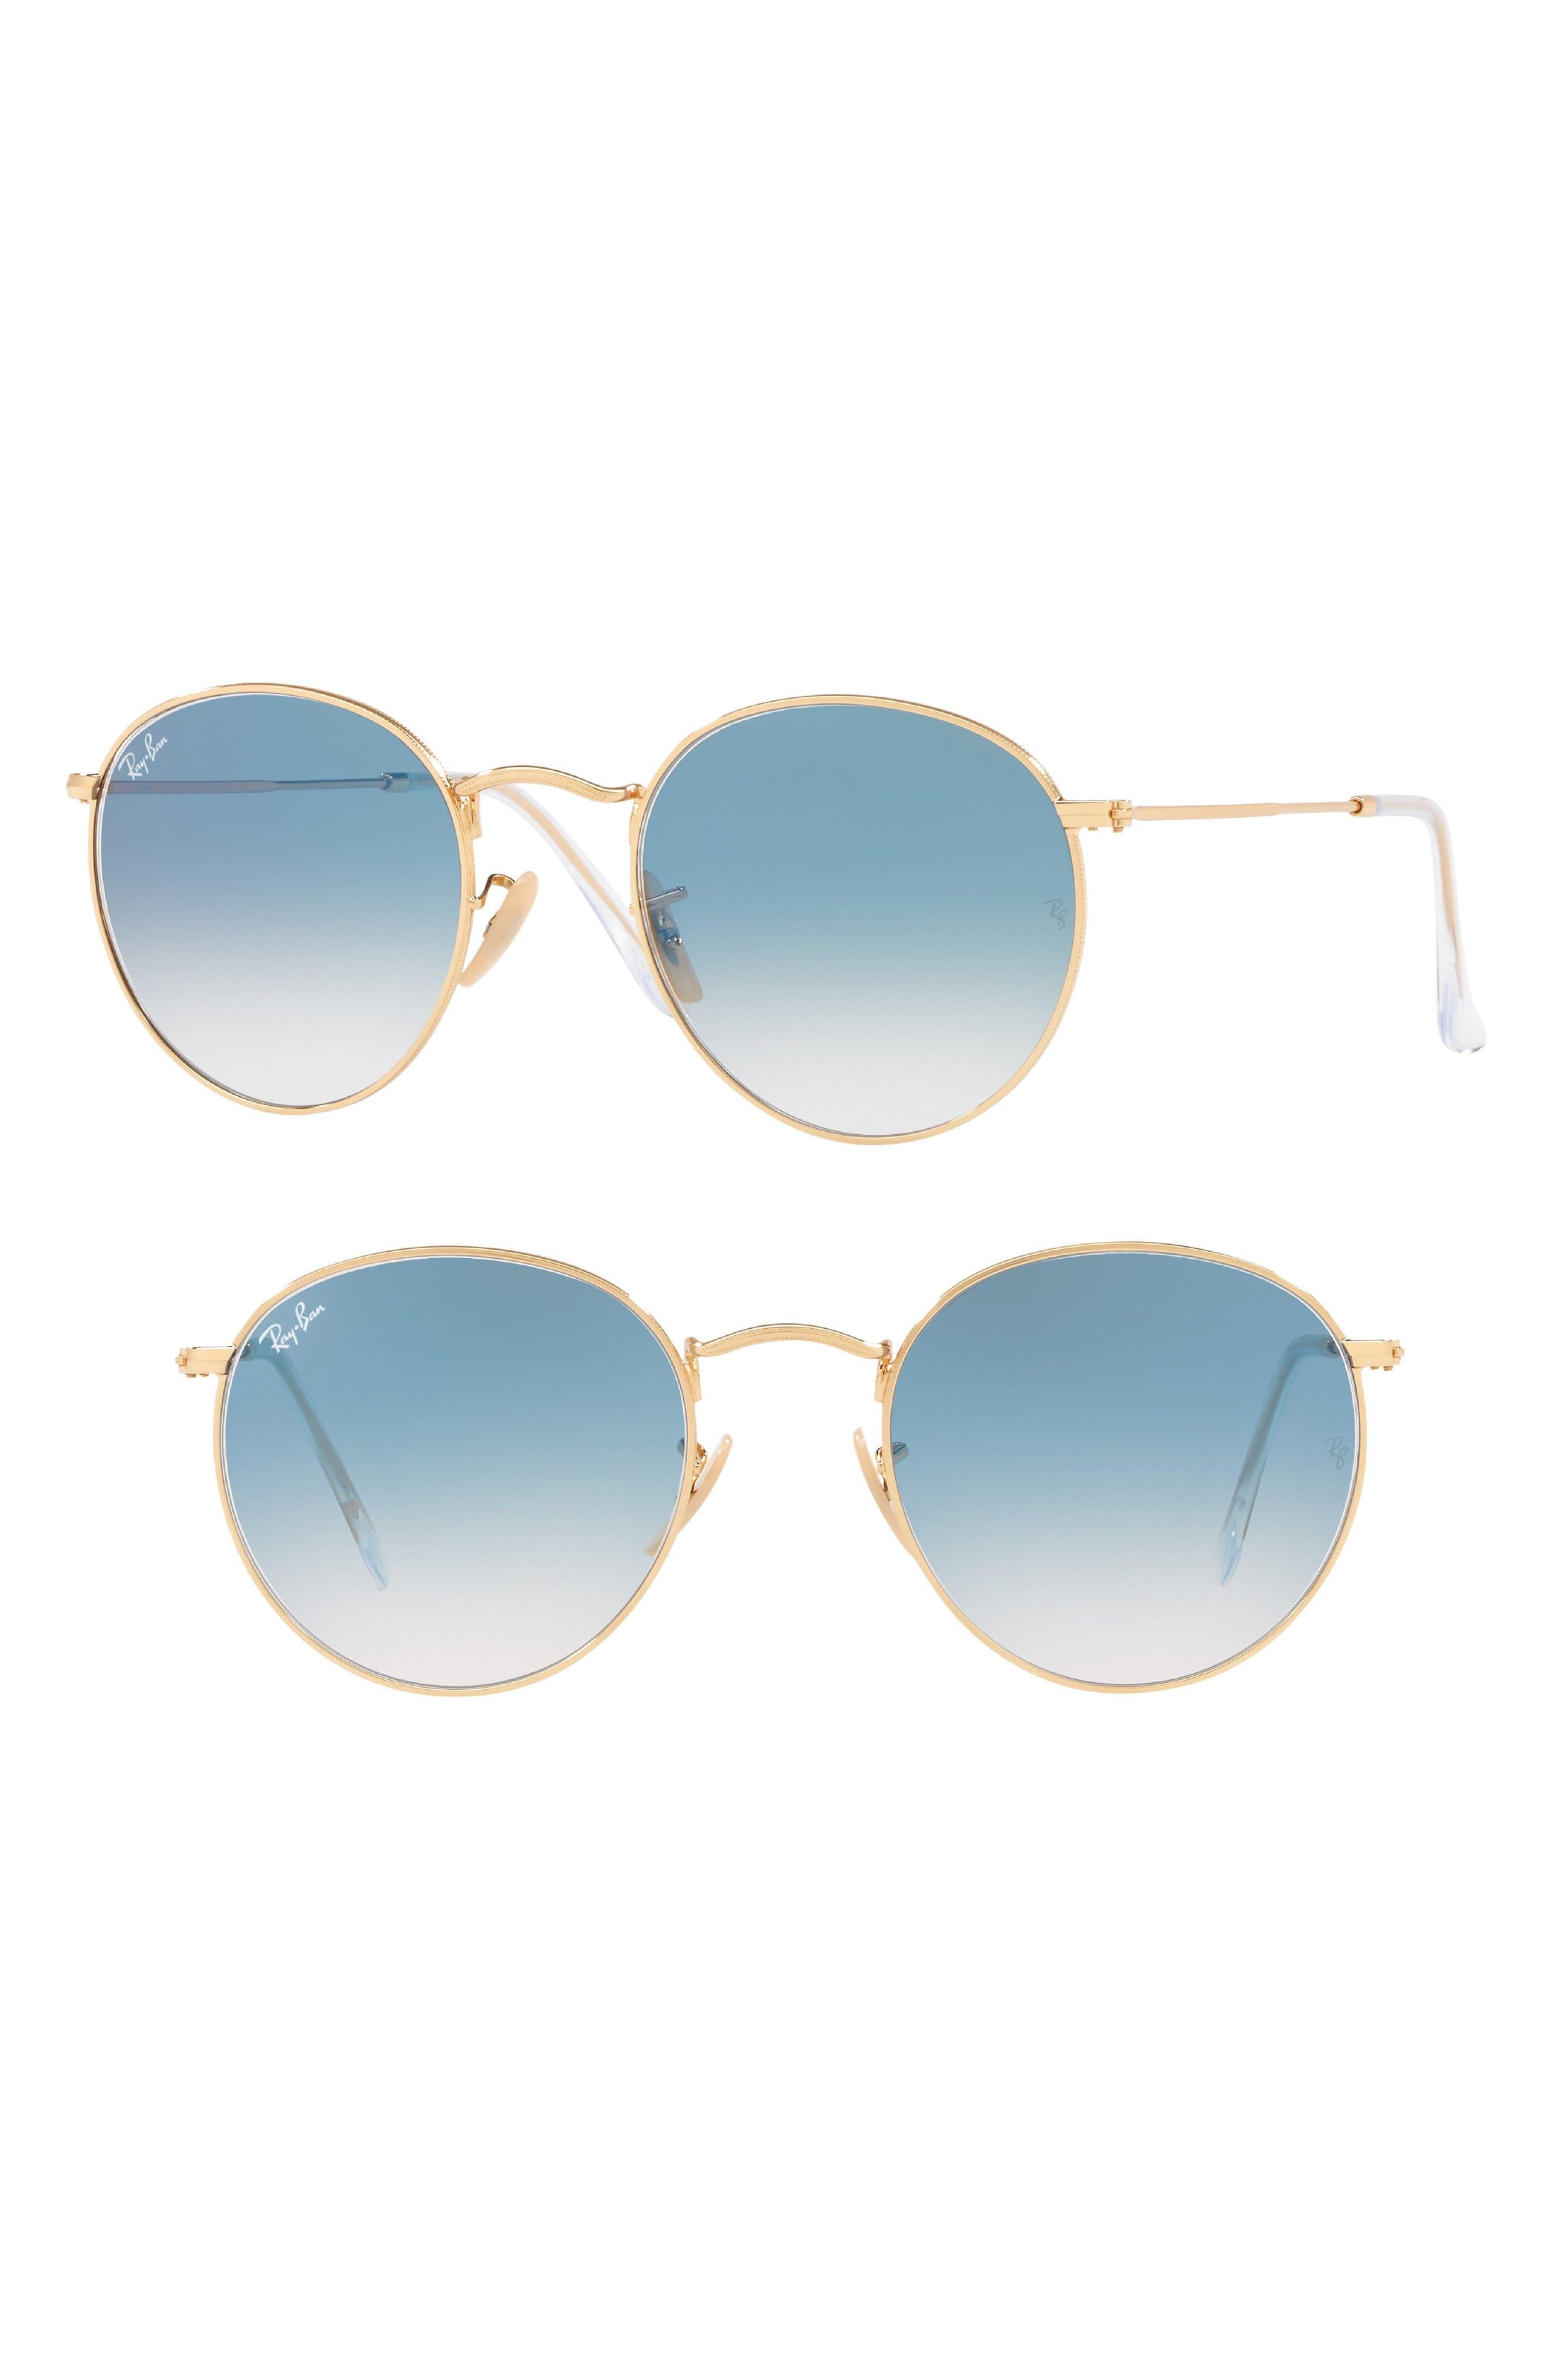 Ray-Ban 5m Round Retro Sunglasses - Gold